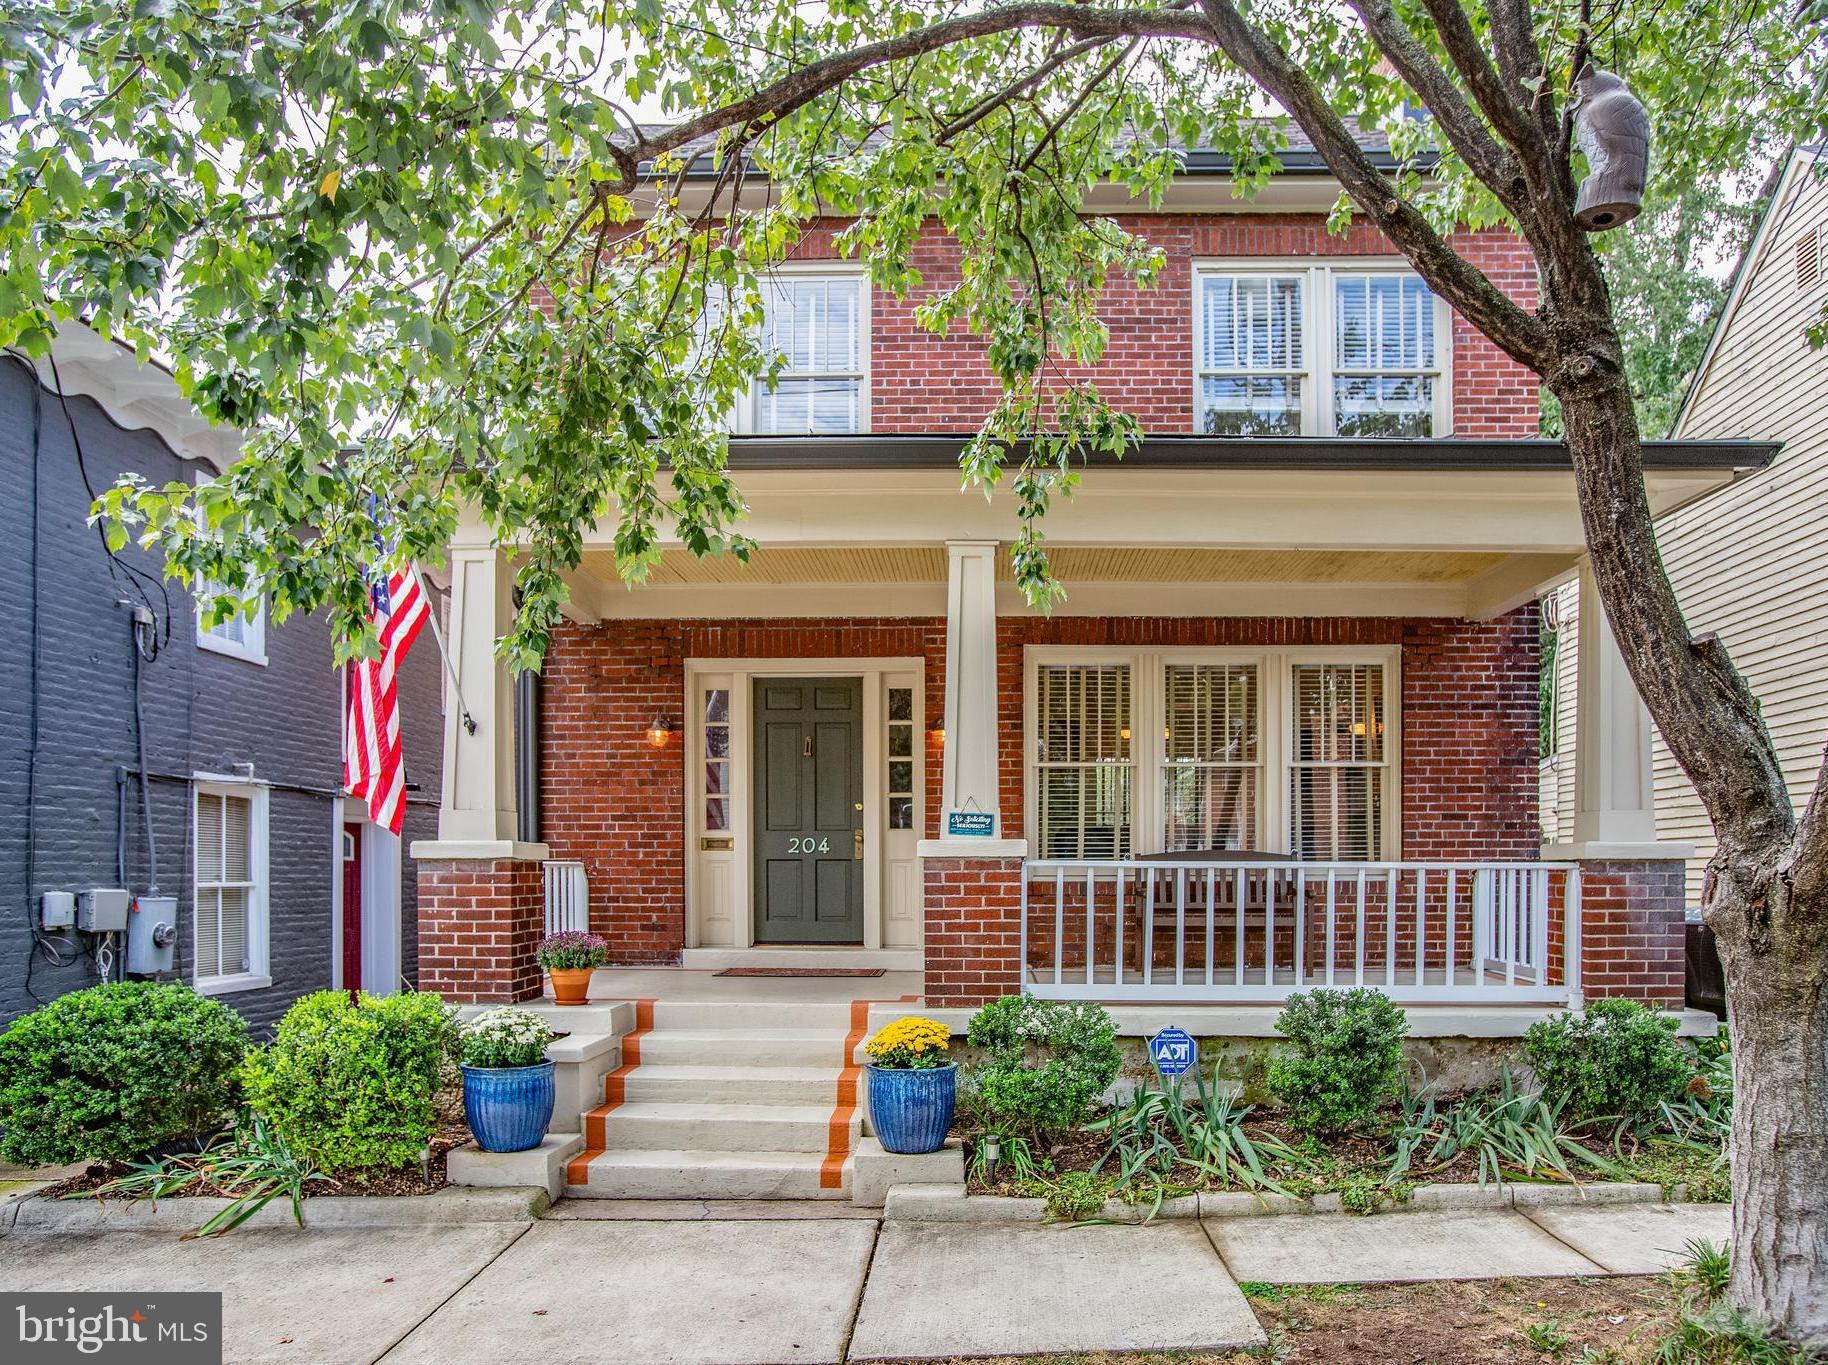 204 Princess Anne Street, Fredericksburg, VA 22401